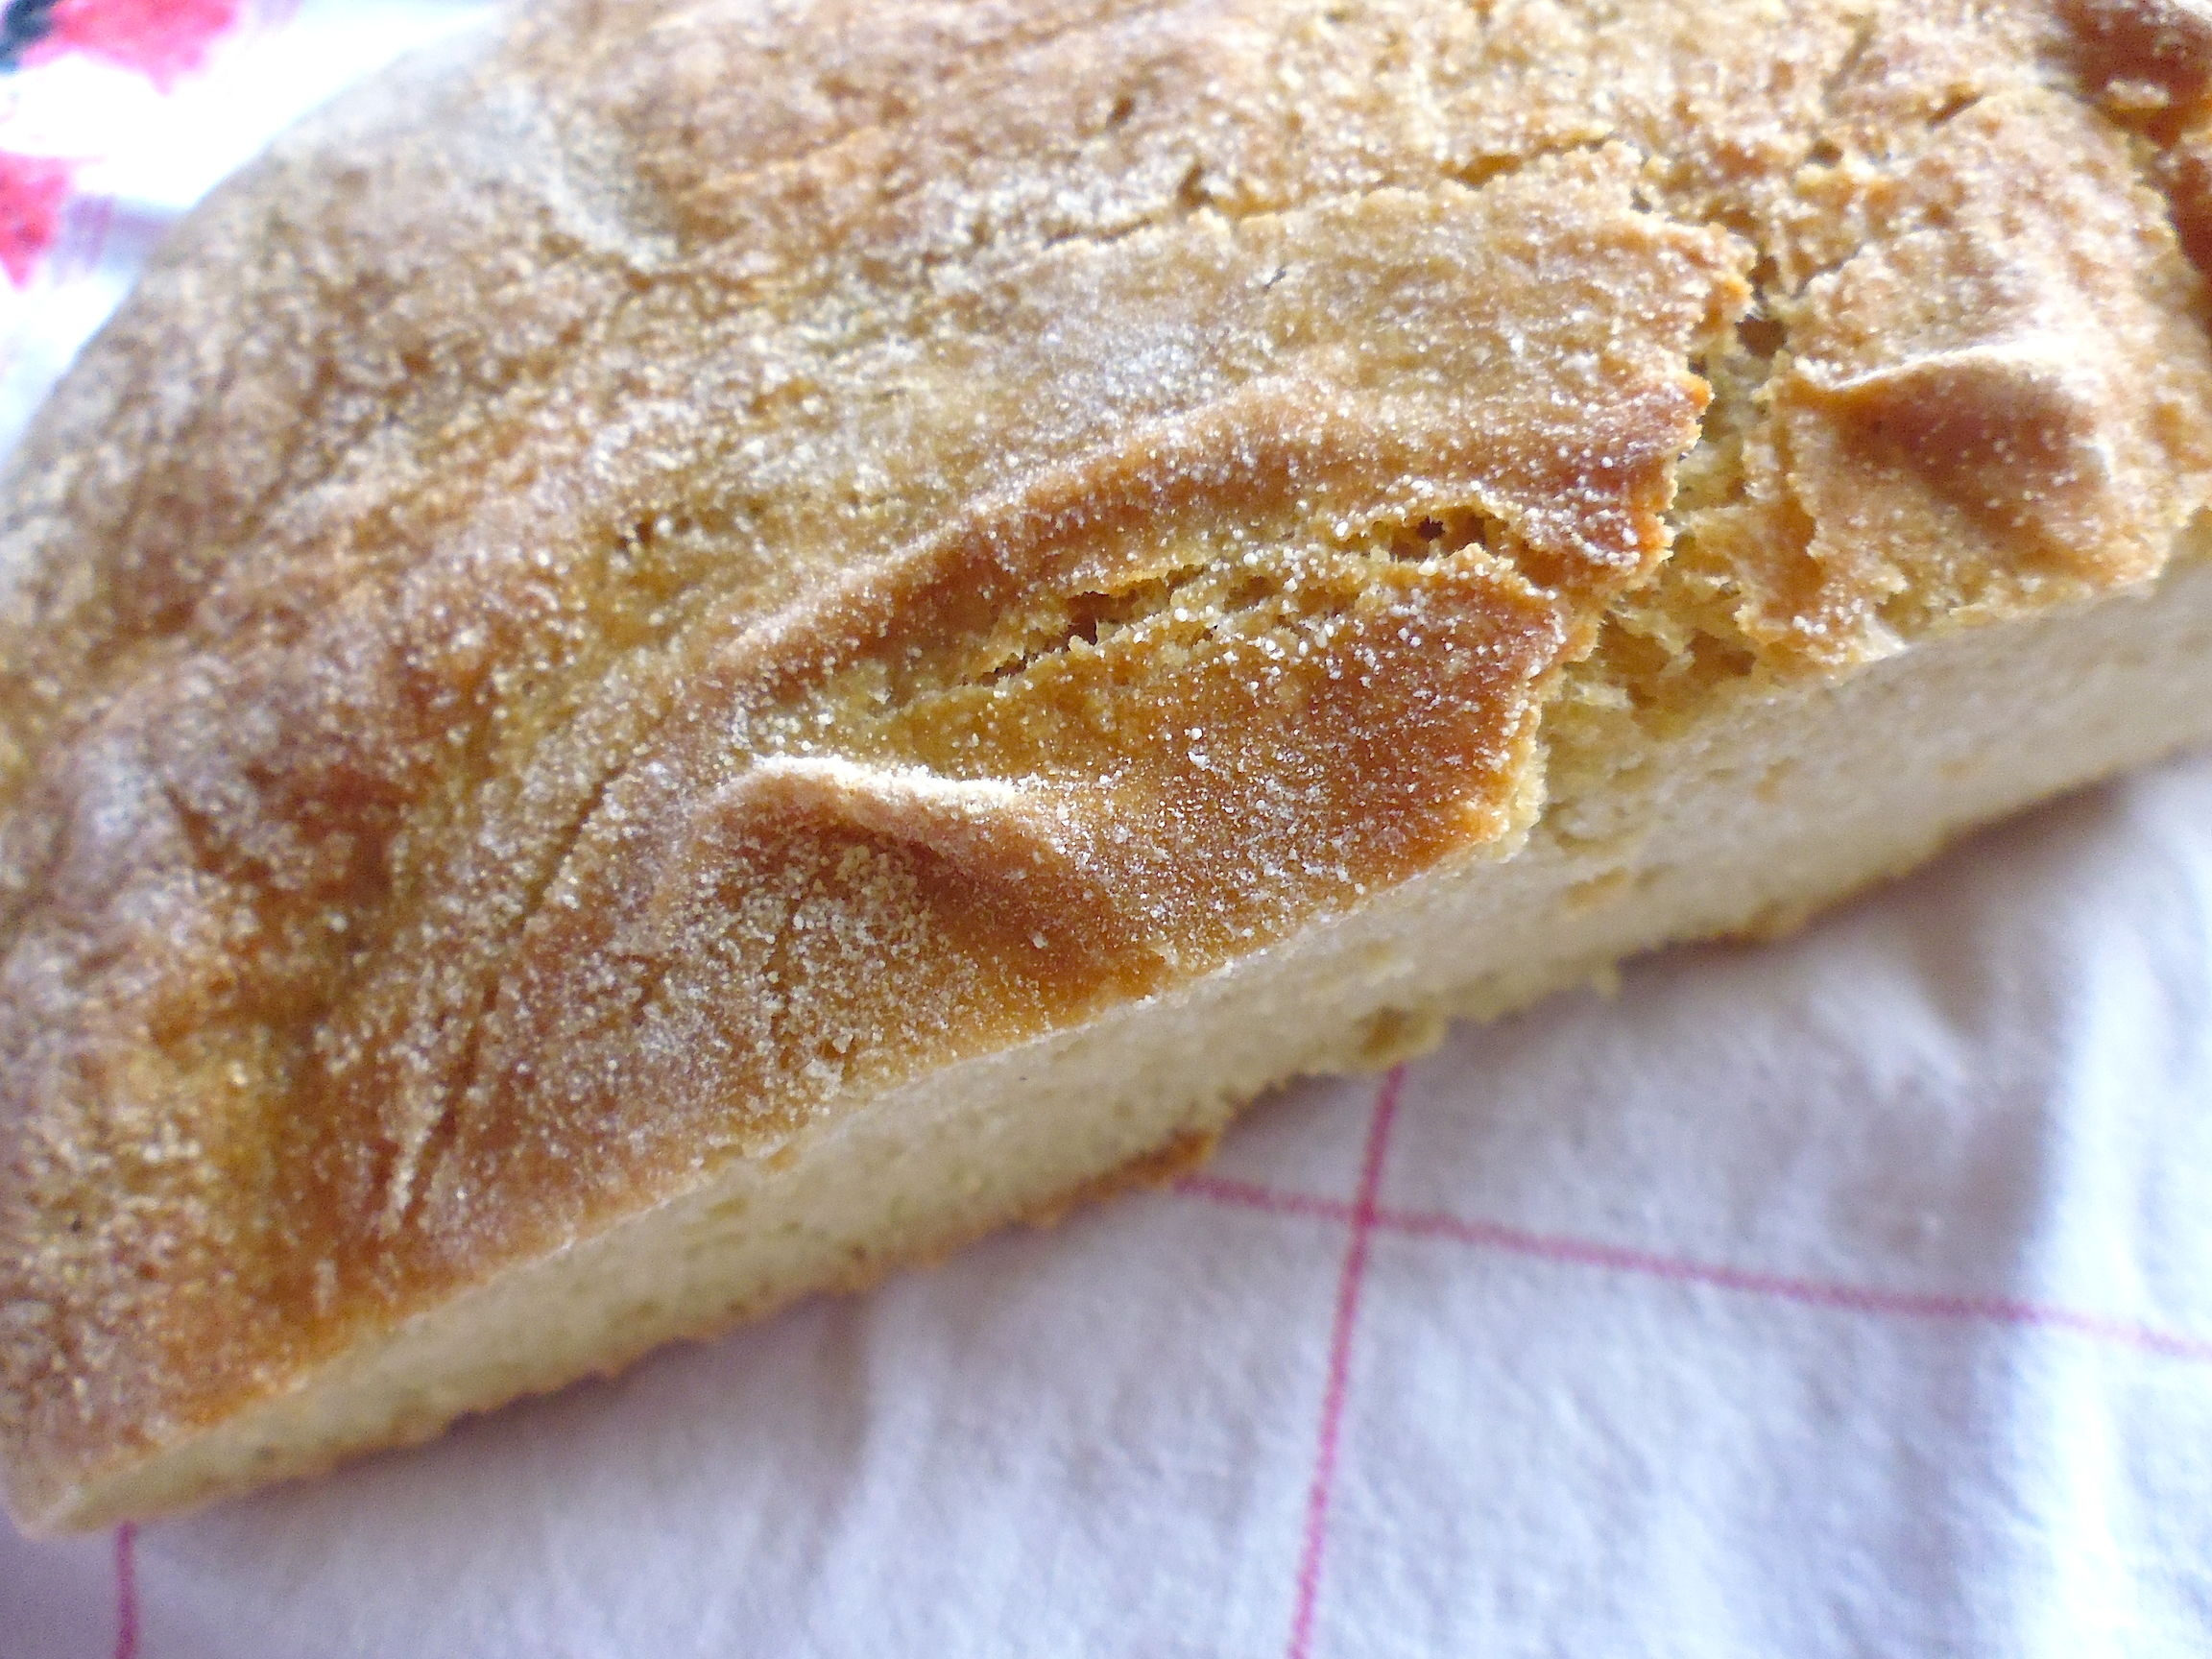 No-Knead Whole Wheat Bread with Sorghum Flour